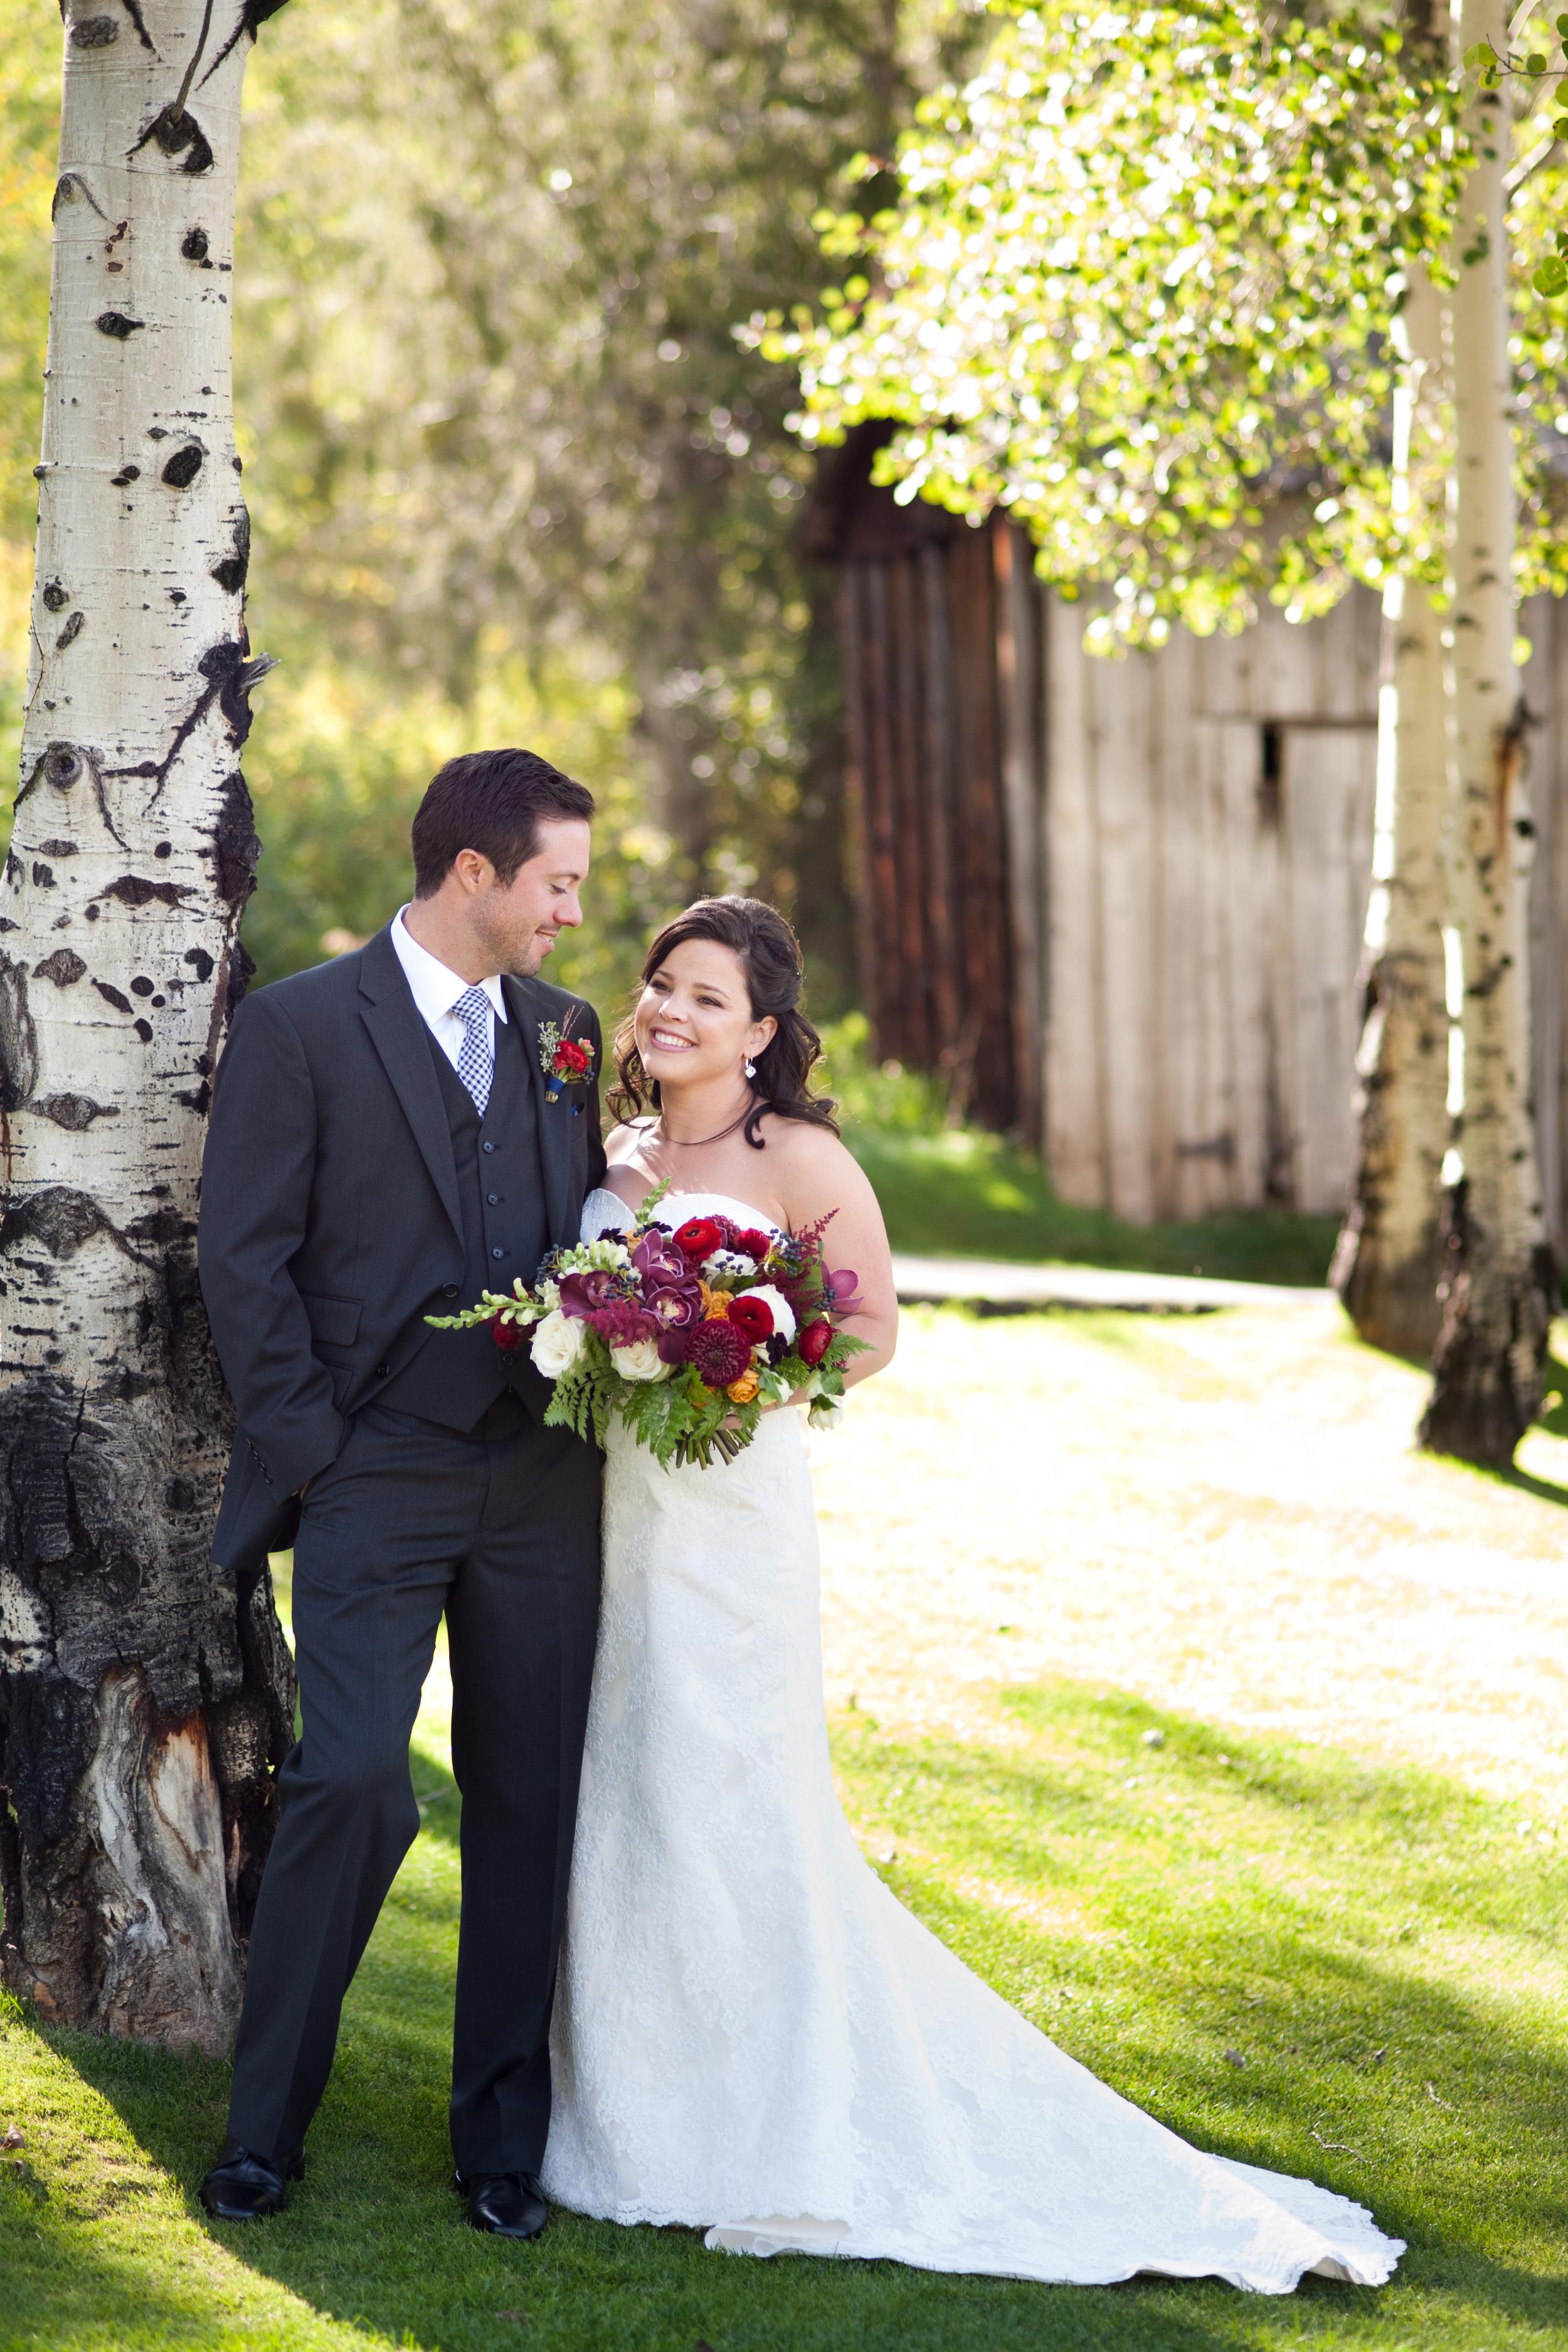 Little White Dress bride Tara   photo by Brinton Studios